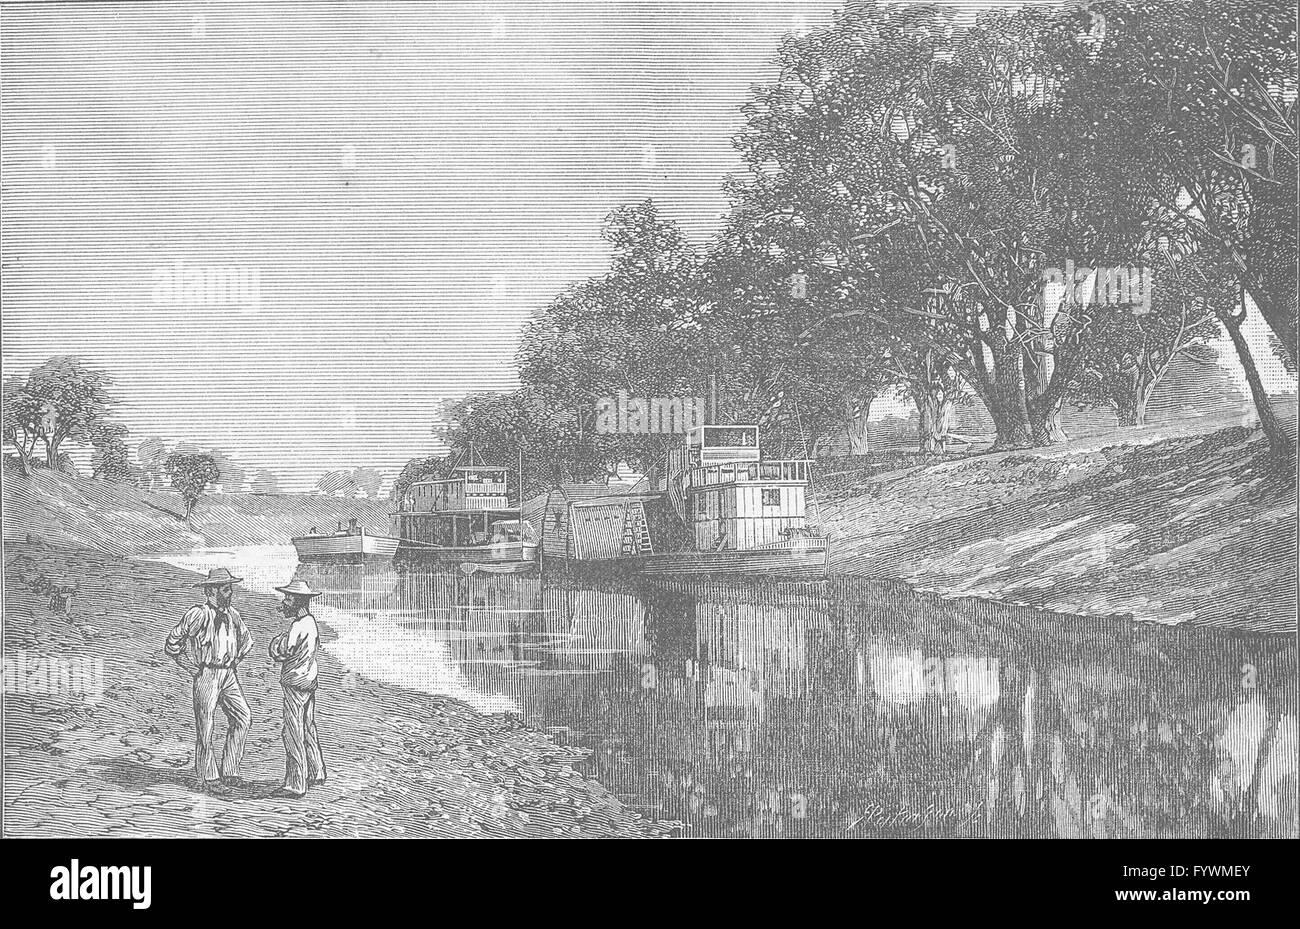 AUSTRALIA: Darling in drought Bourke, antique print 1890 - Stock Image